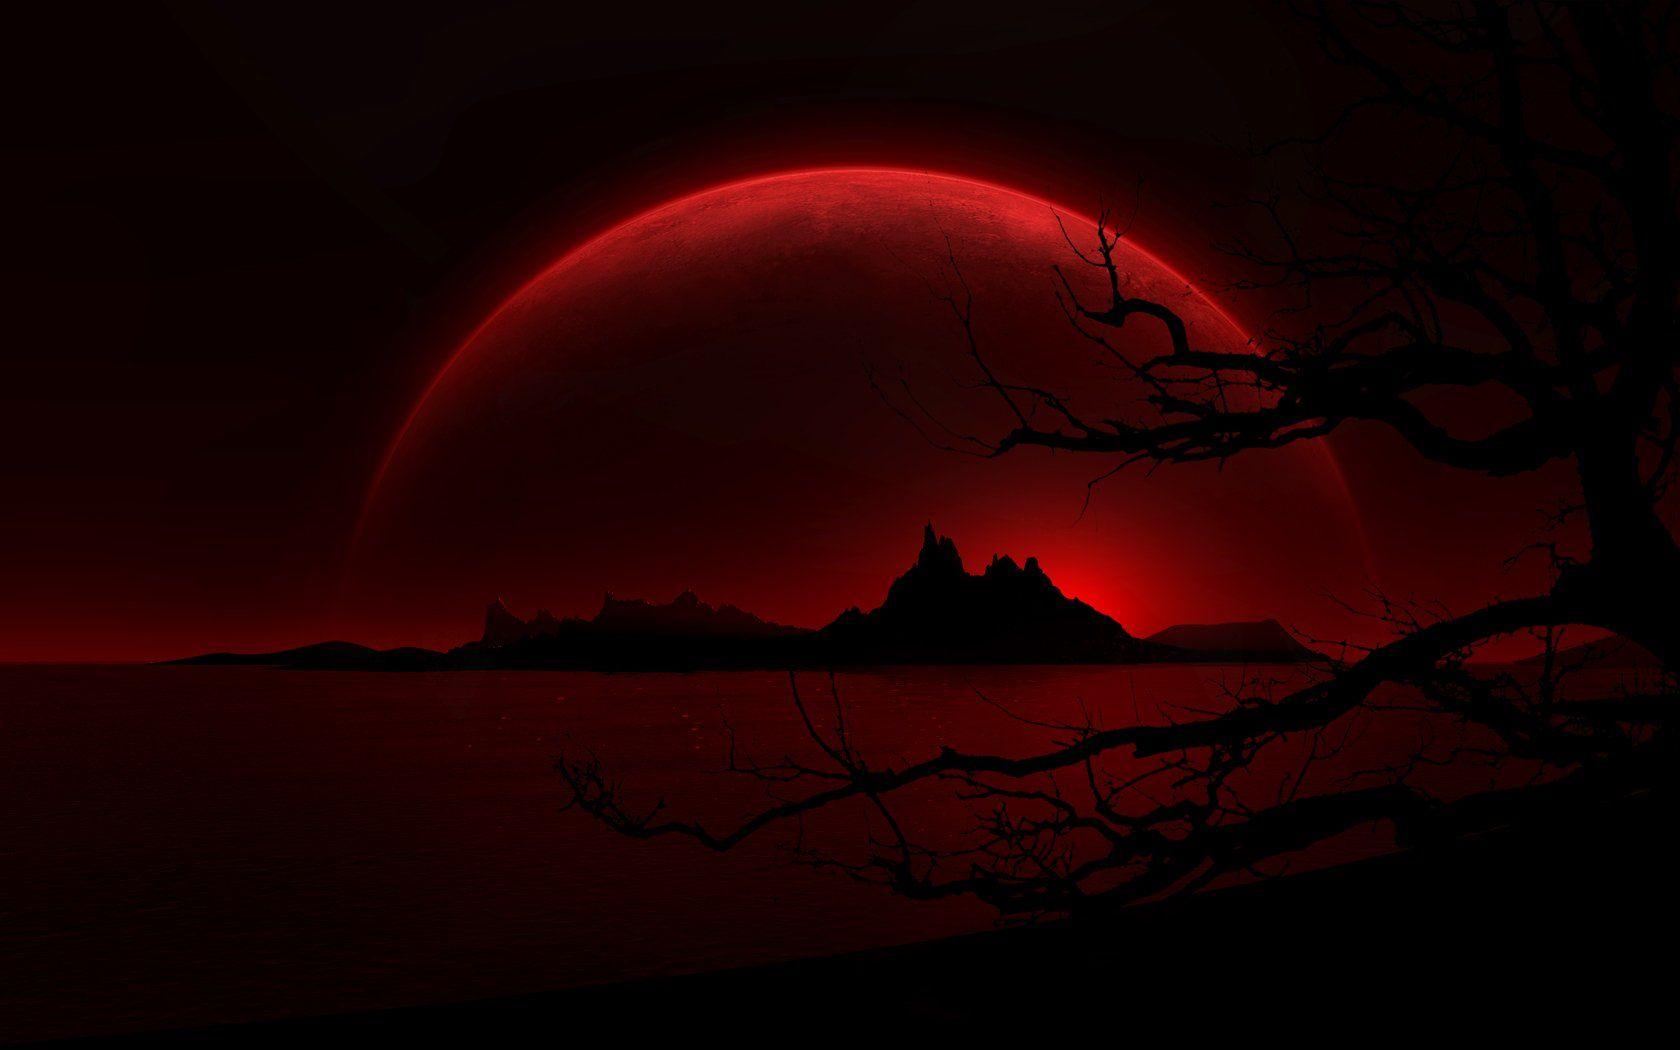 Dark Landscape Red Moon Crimson Night Dark Black Wallpaper Papel De Parede Vermelho Escuro Papel De Parede Vermelho E Preto Papel De Parede Vermelho